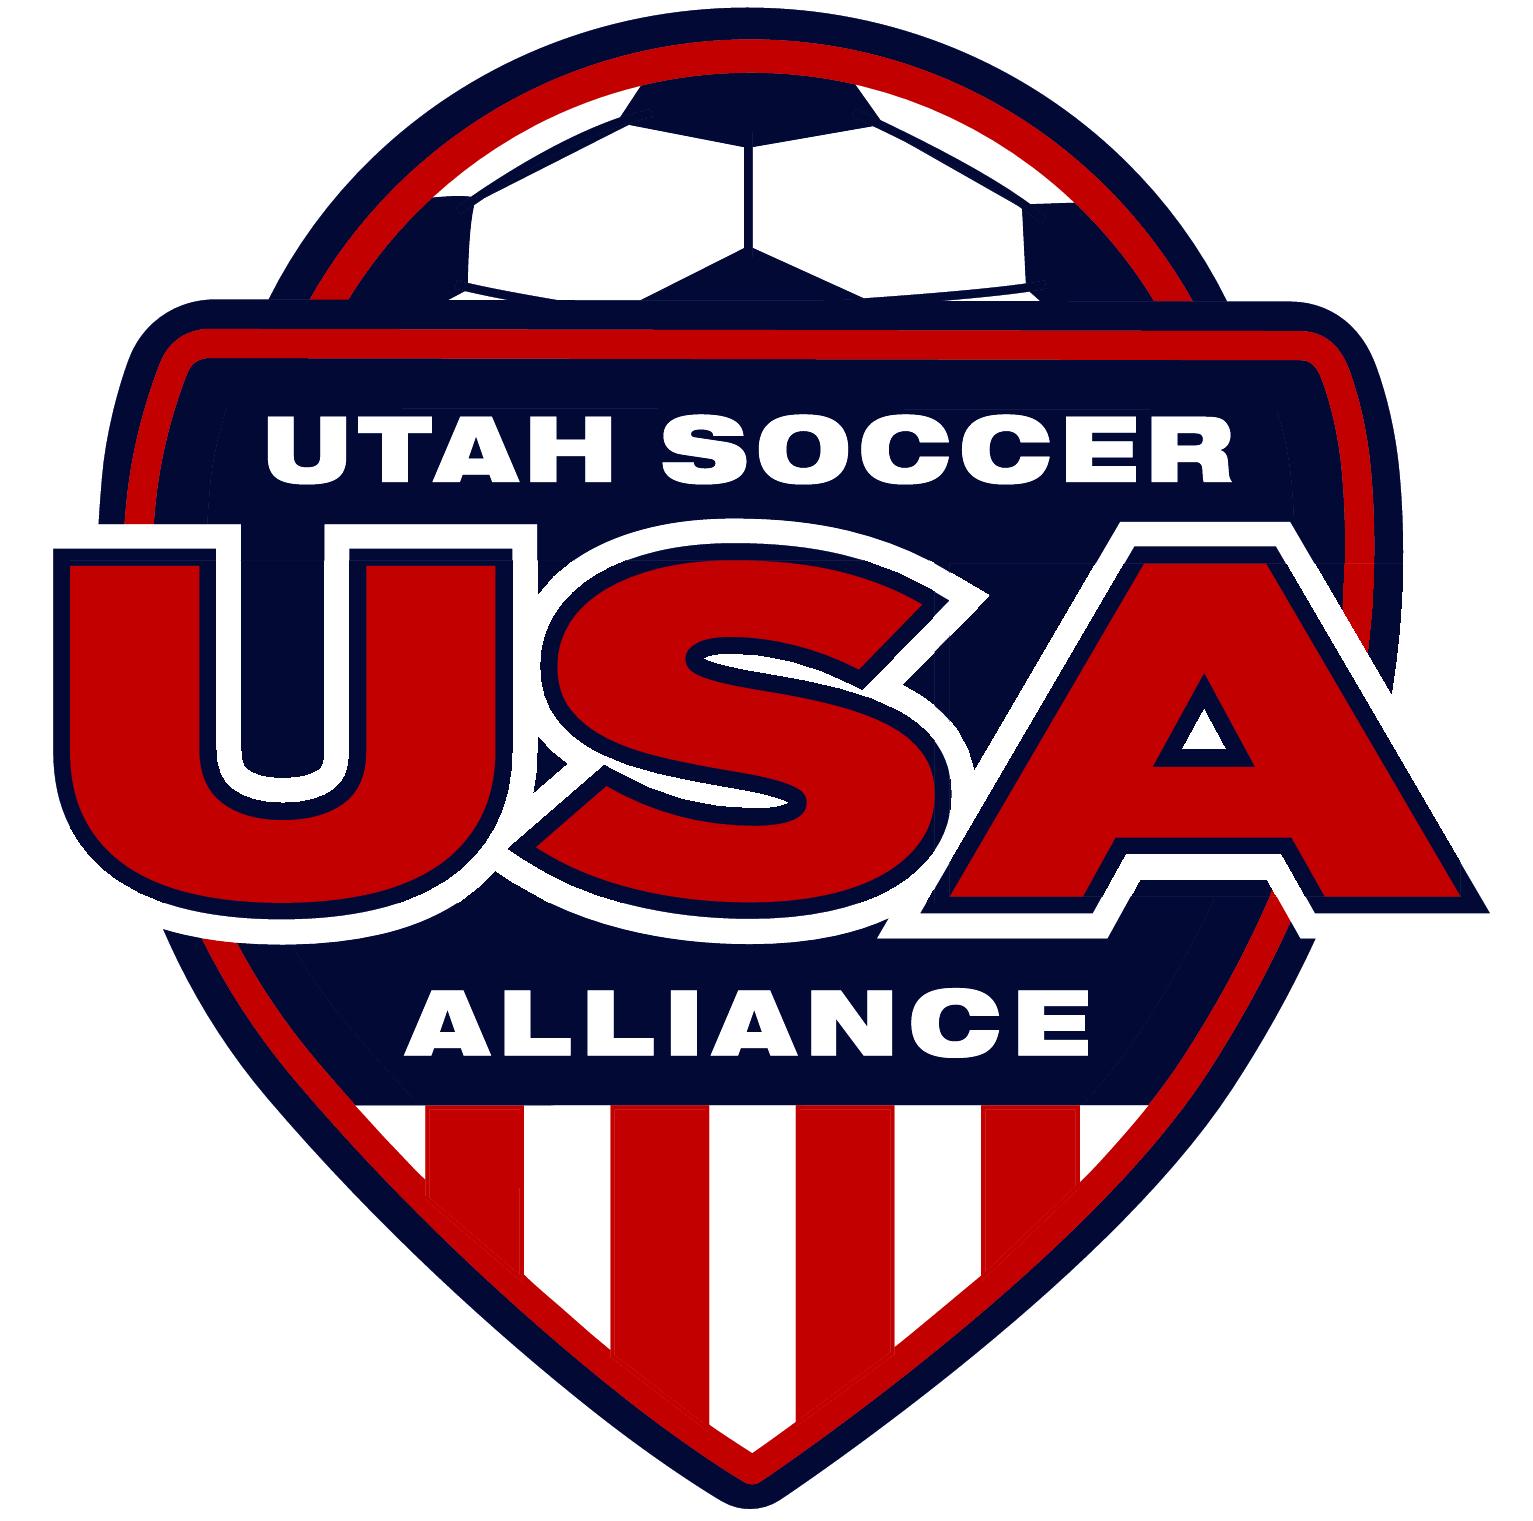 USA_SoccerLogo_dark.eps.png